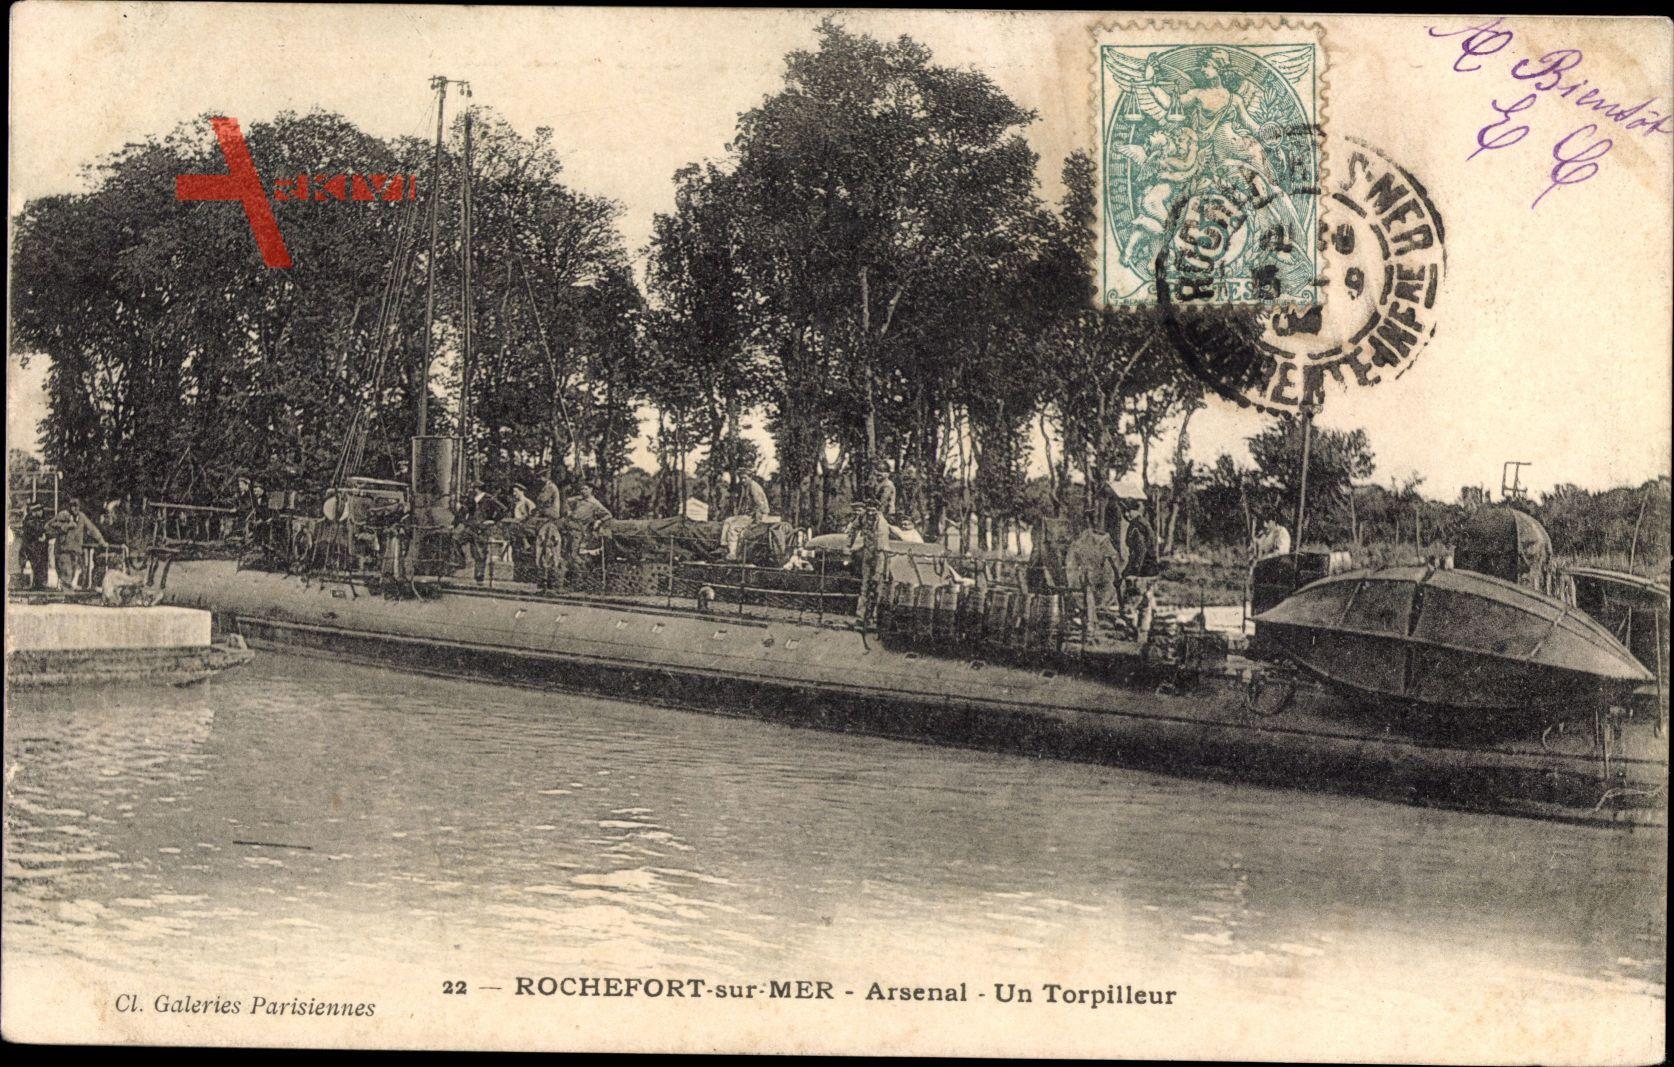 Rochefort sur Mer Charente Maritime, Arsenal, Torpilleur, Marine Militaire